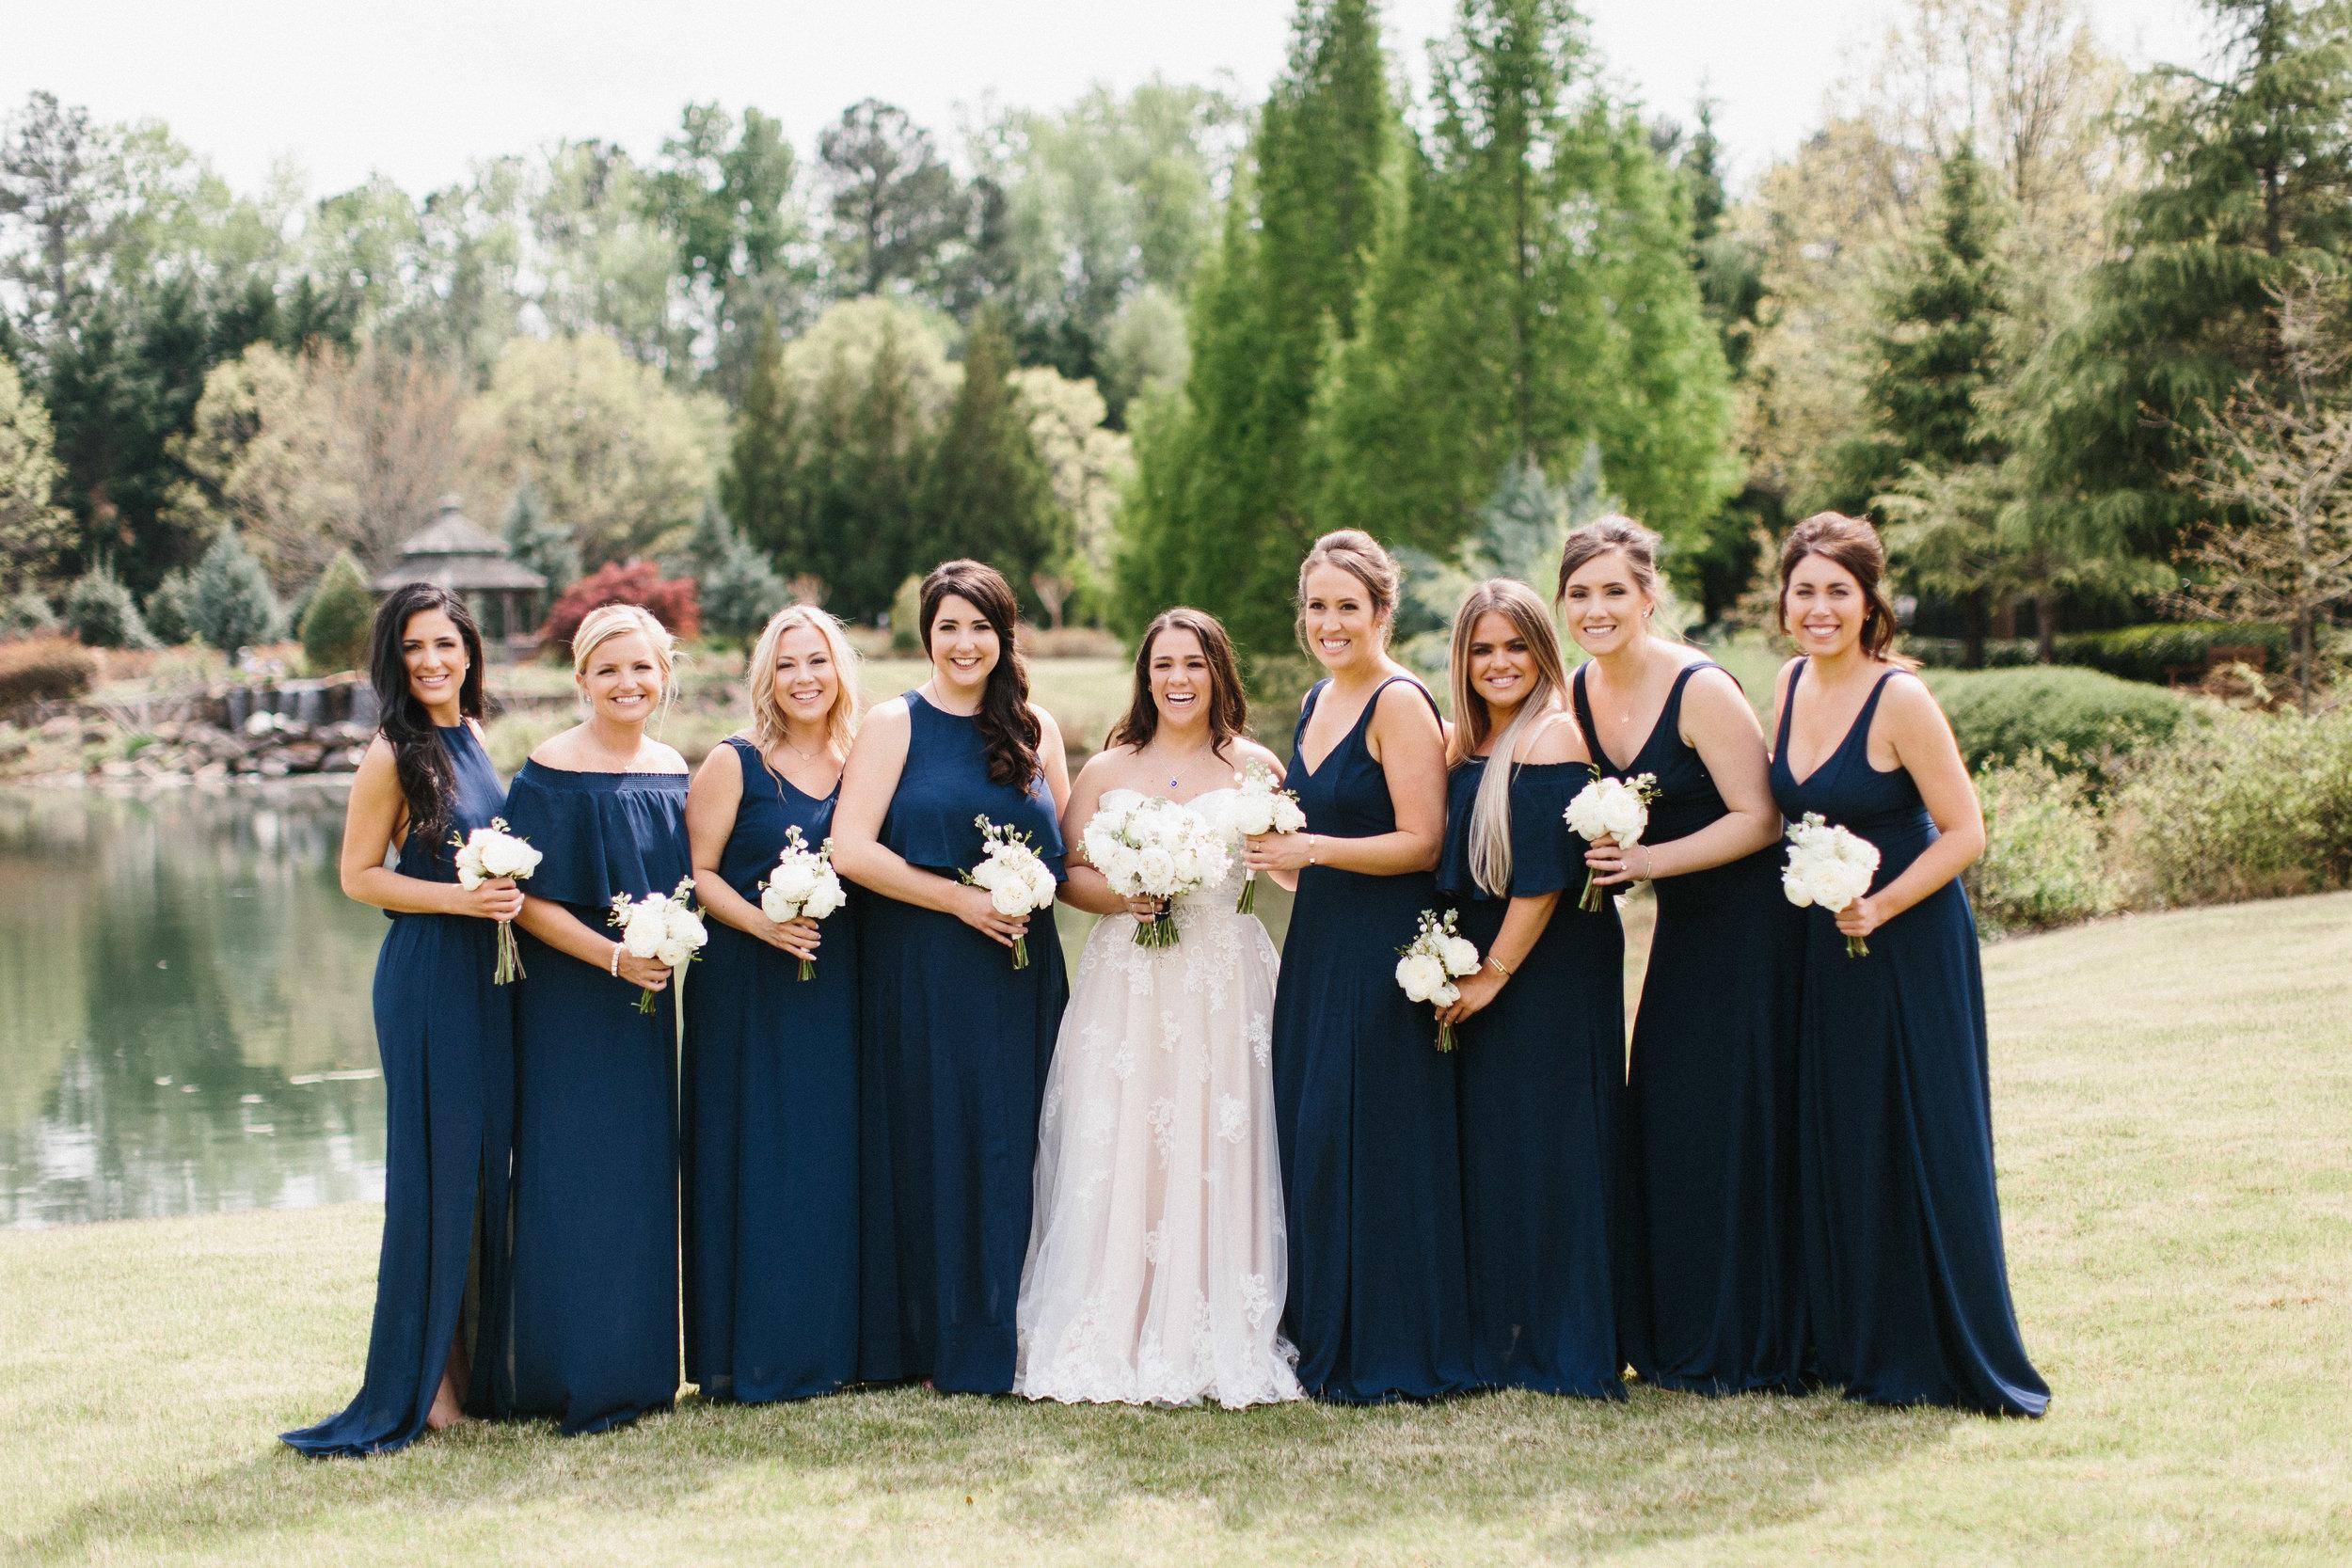 roswell_st_peter_chanel_catholic_avalon_hotel_alpharetta_wedding-1676.jpg